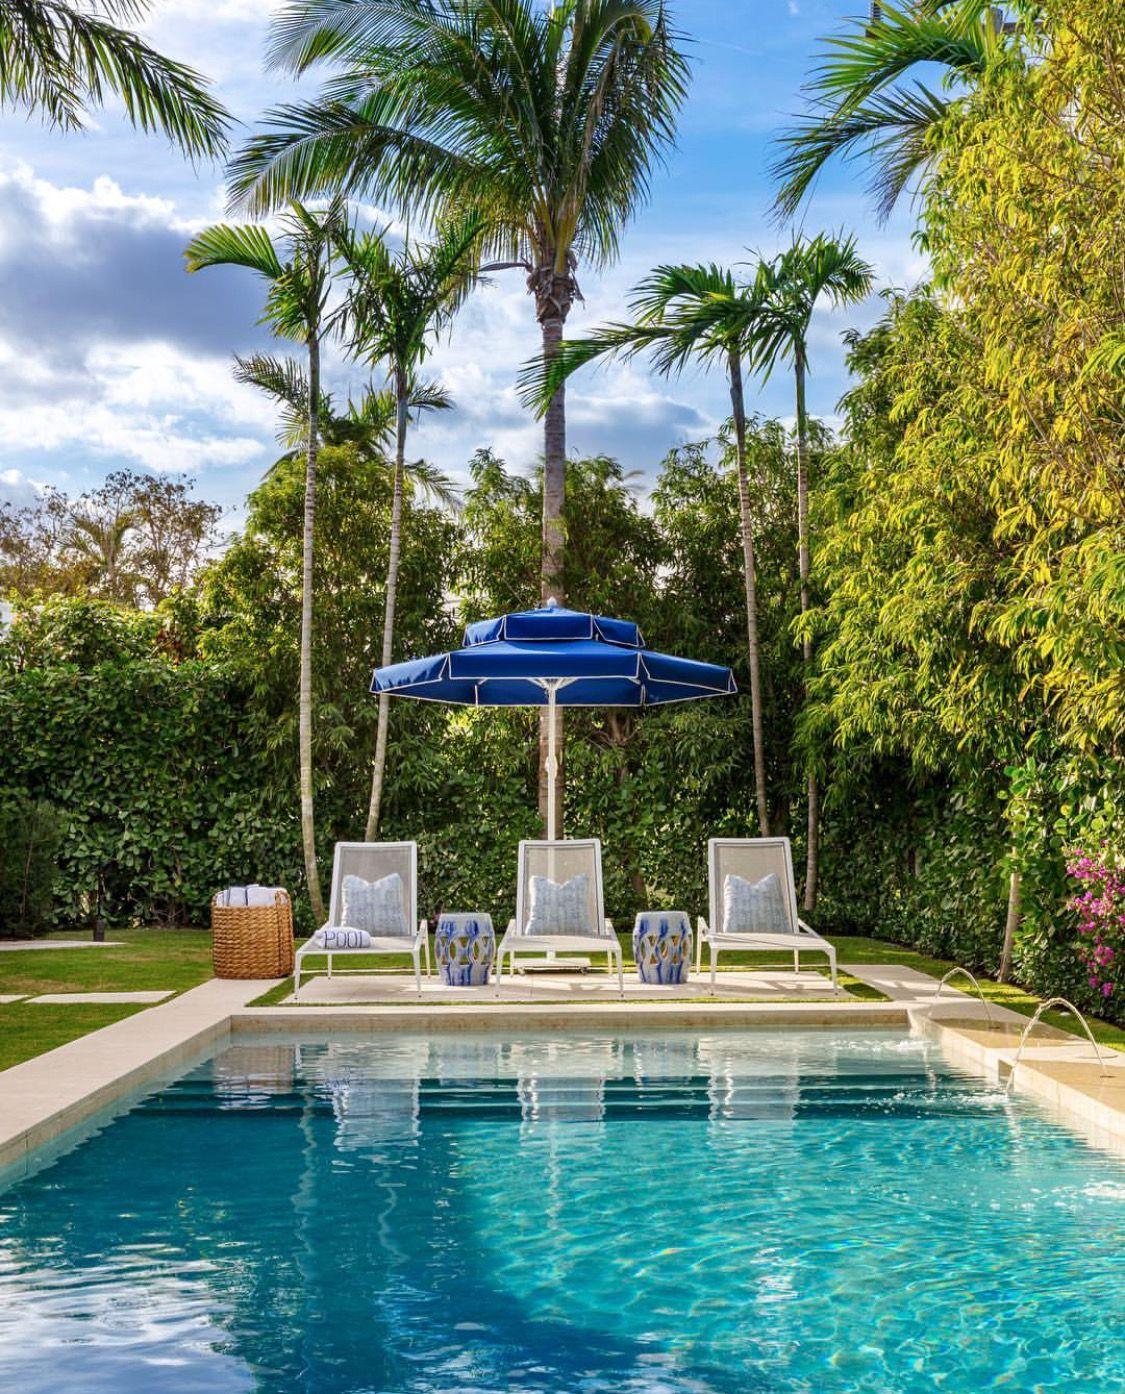 Skinny Dipping Backyard - House Backyards